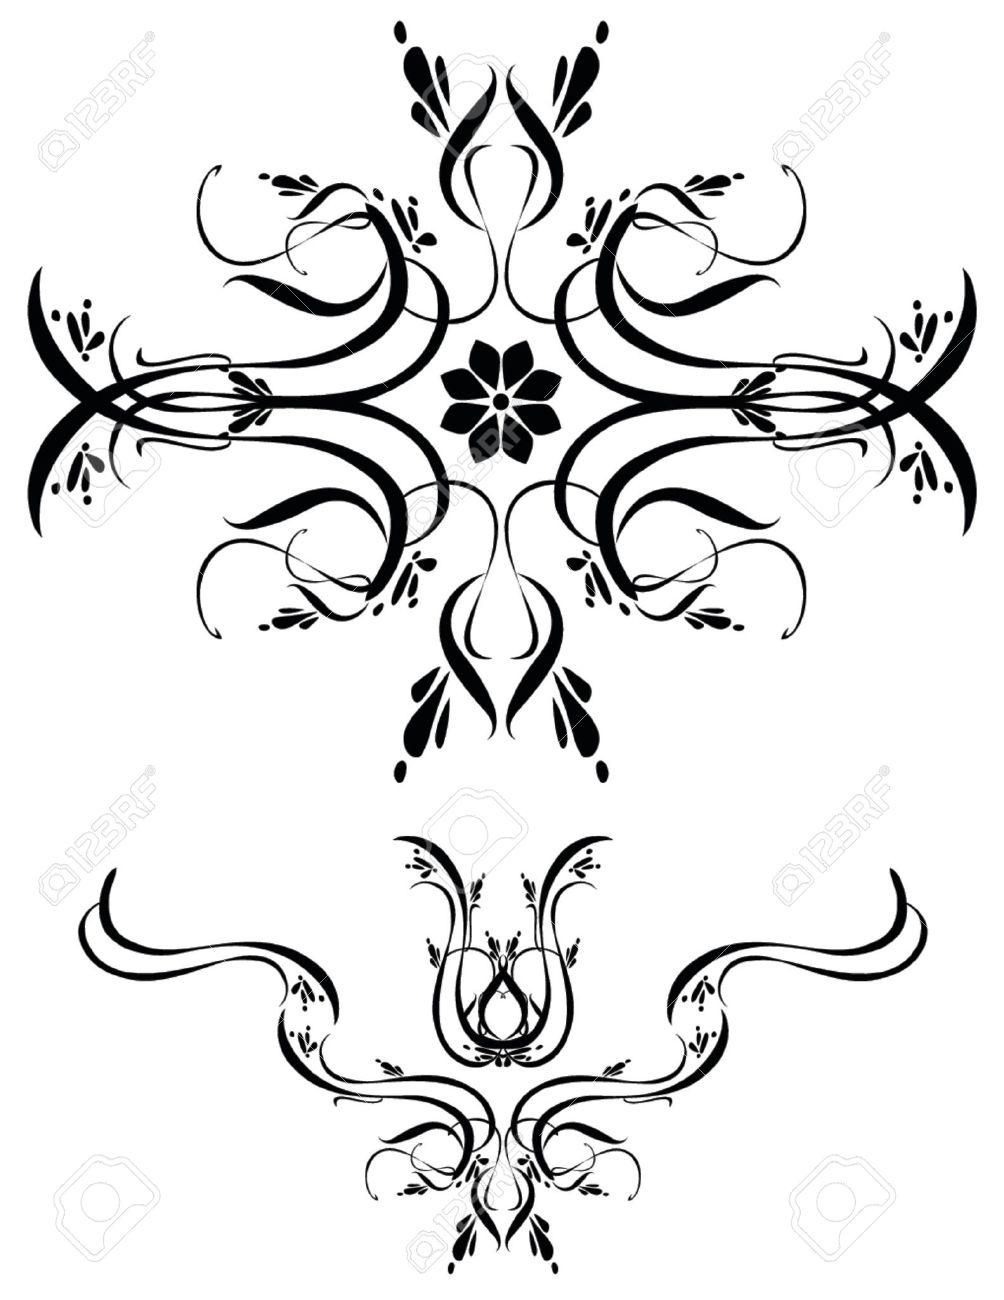 unique graphics useful as decorations ornaments and separators